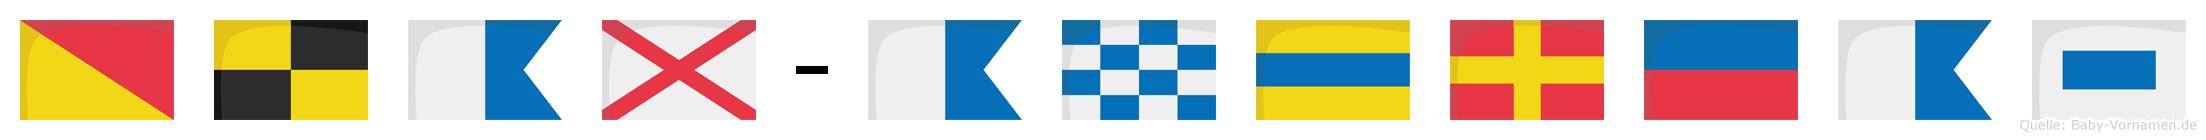 Olav-Andreas im Flaggenalphabet